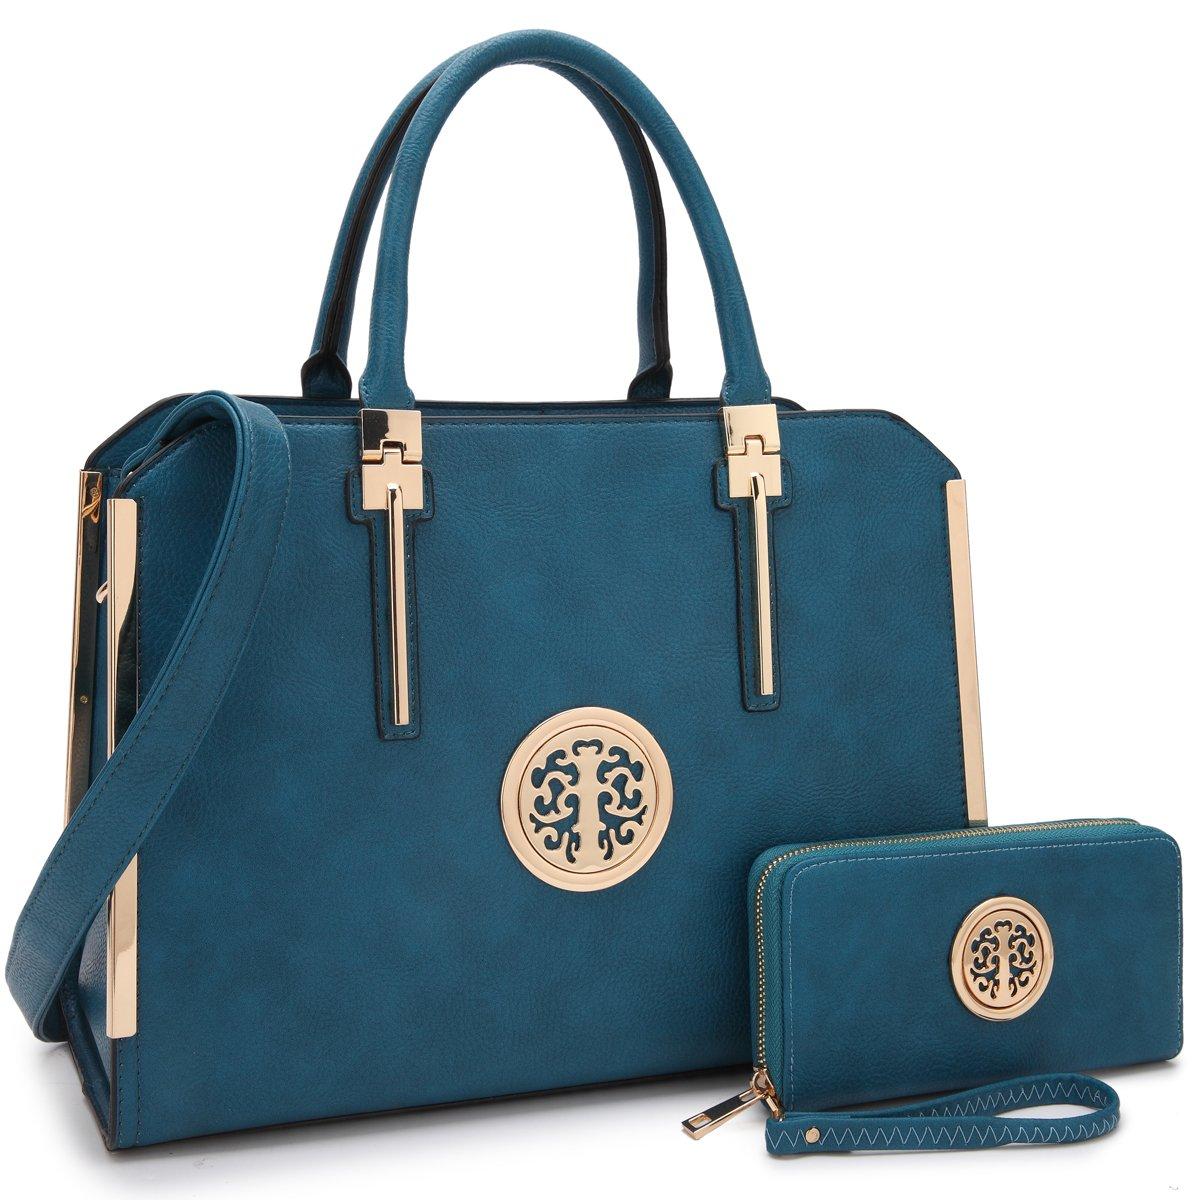 Dasein Handbags for Women Tote Purse Shoulder Bag Top Handle Satchel for Ladies